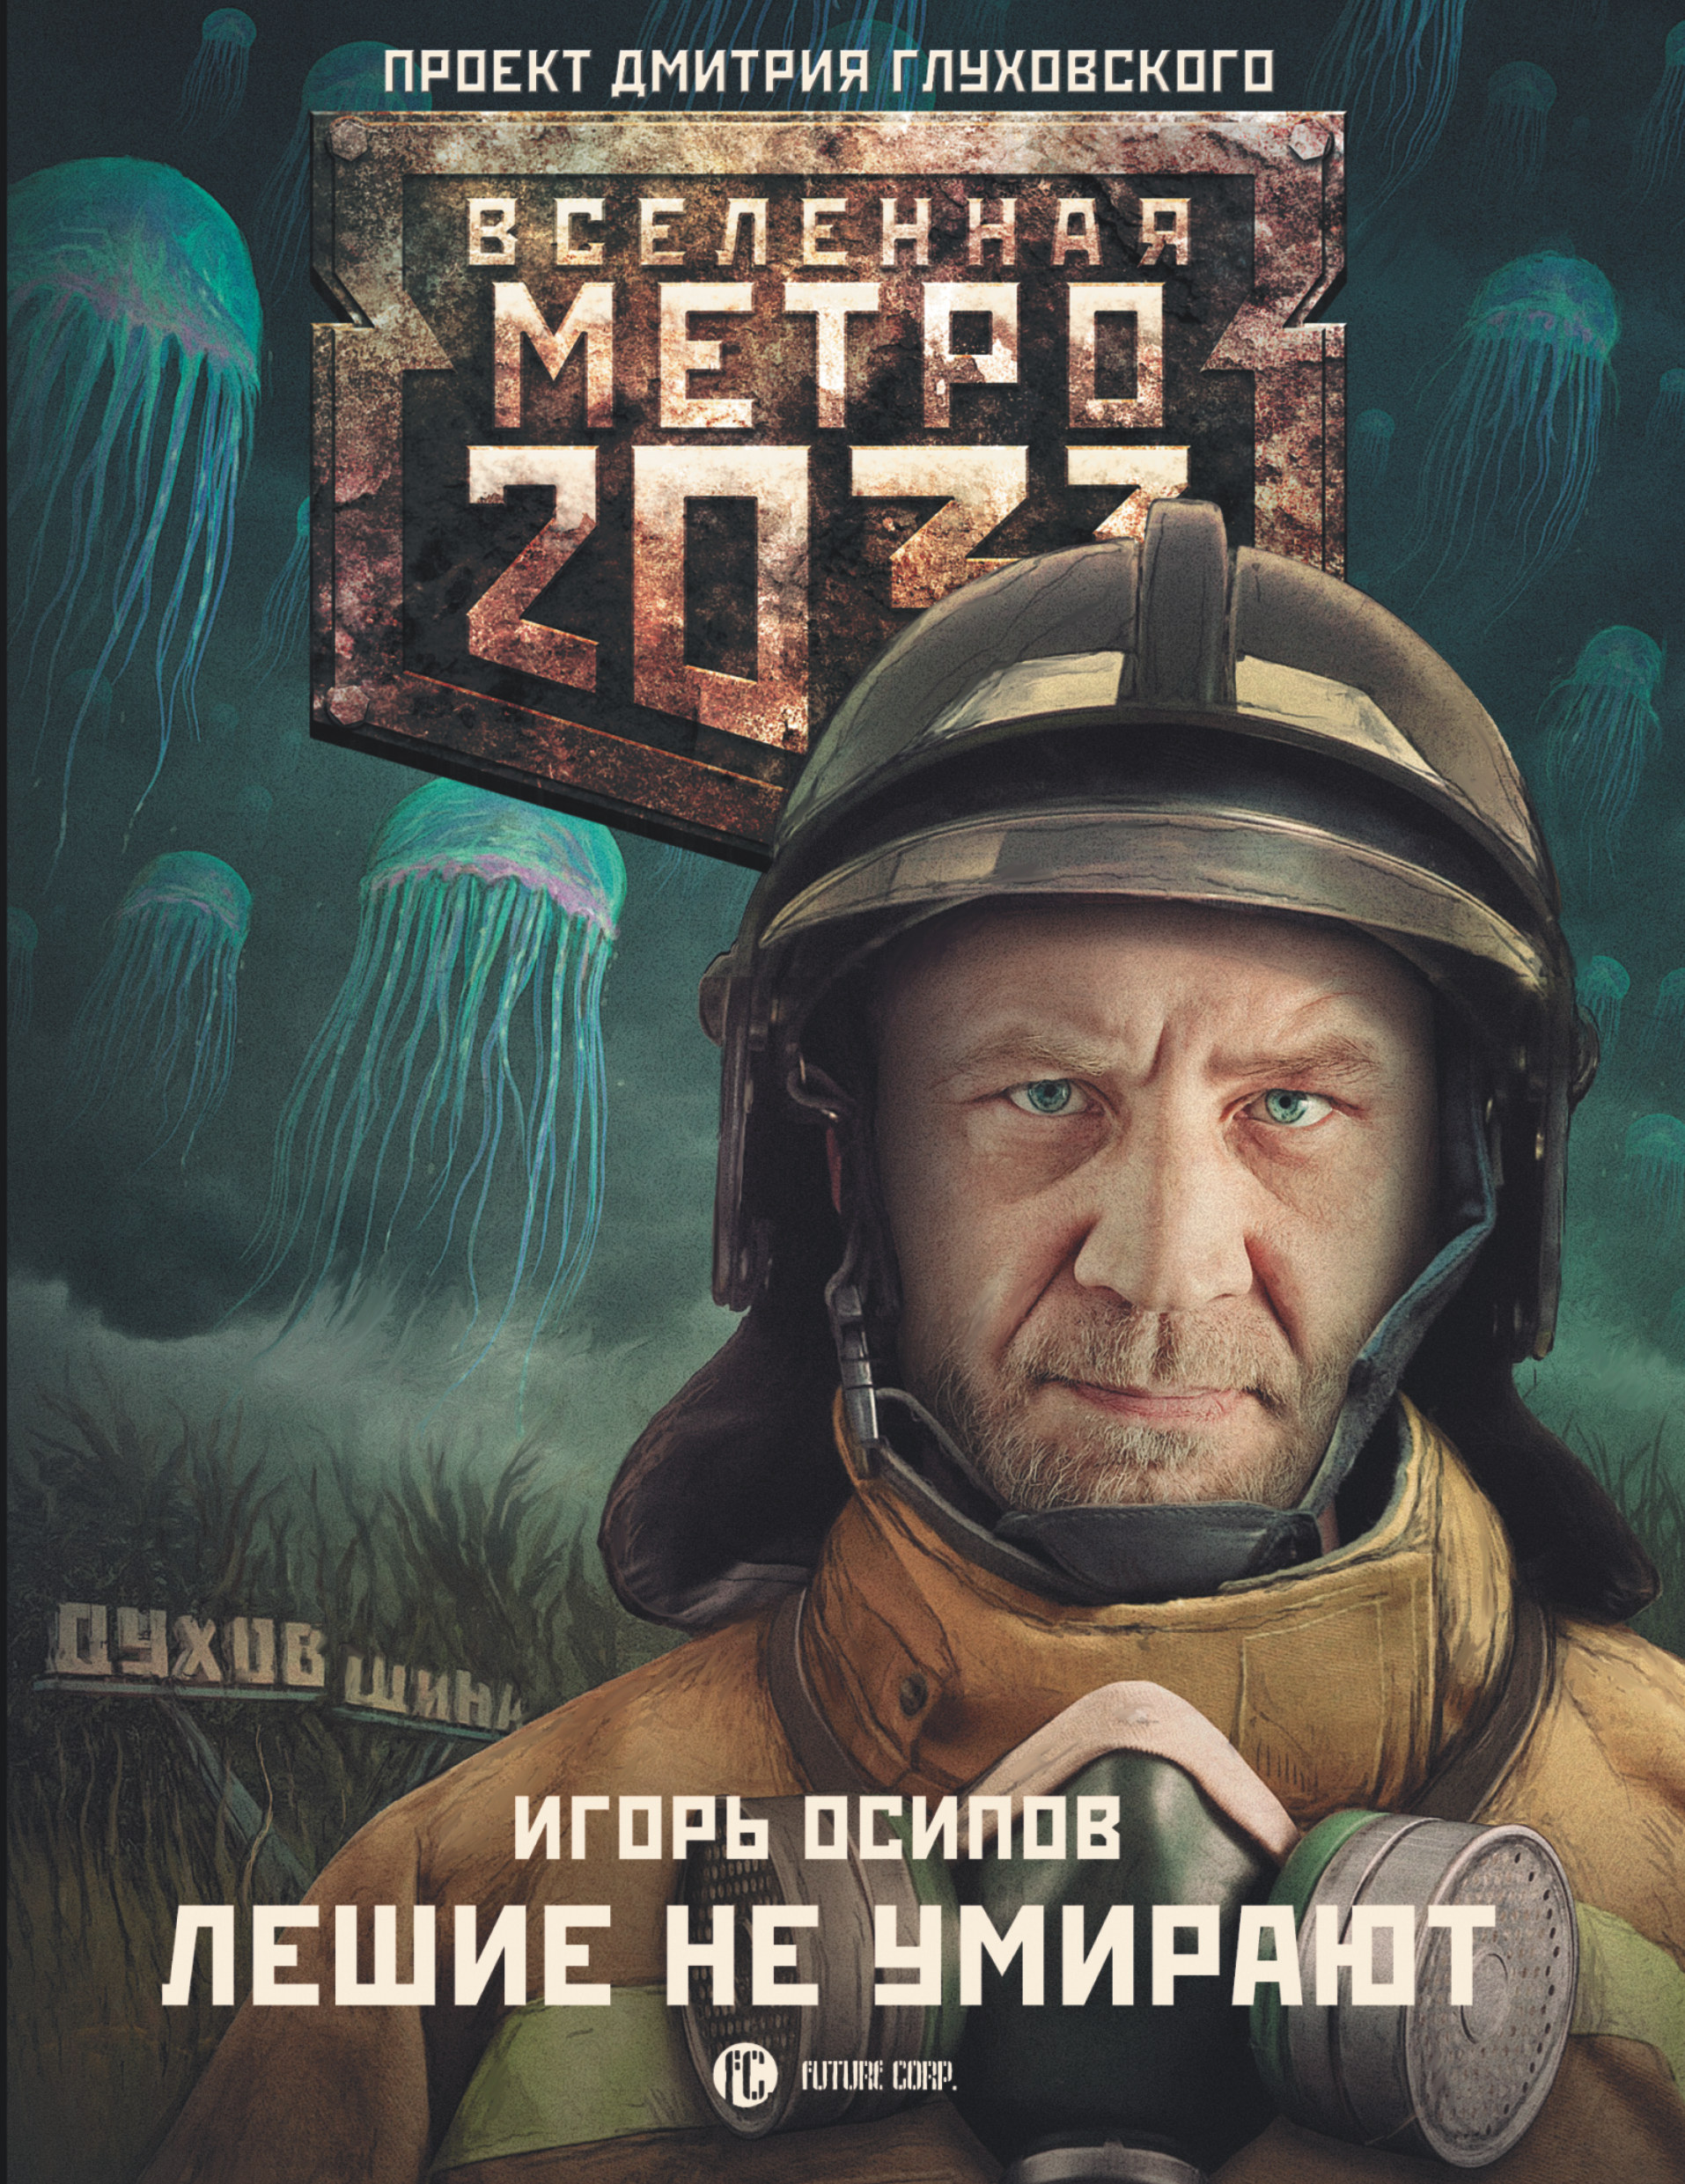 Осипов И.В. Метро 2033: Лешие не умирают метро 2033 право на жизнь